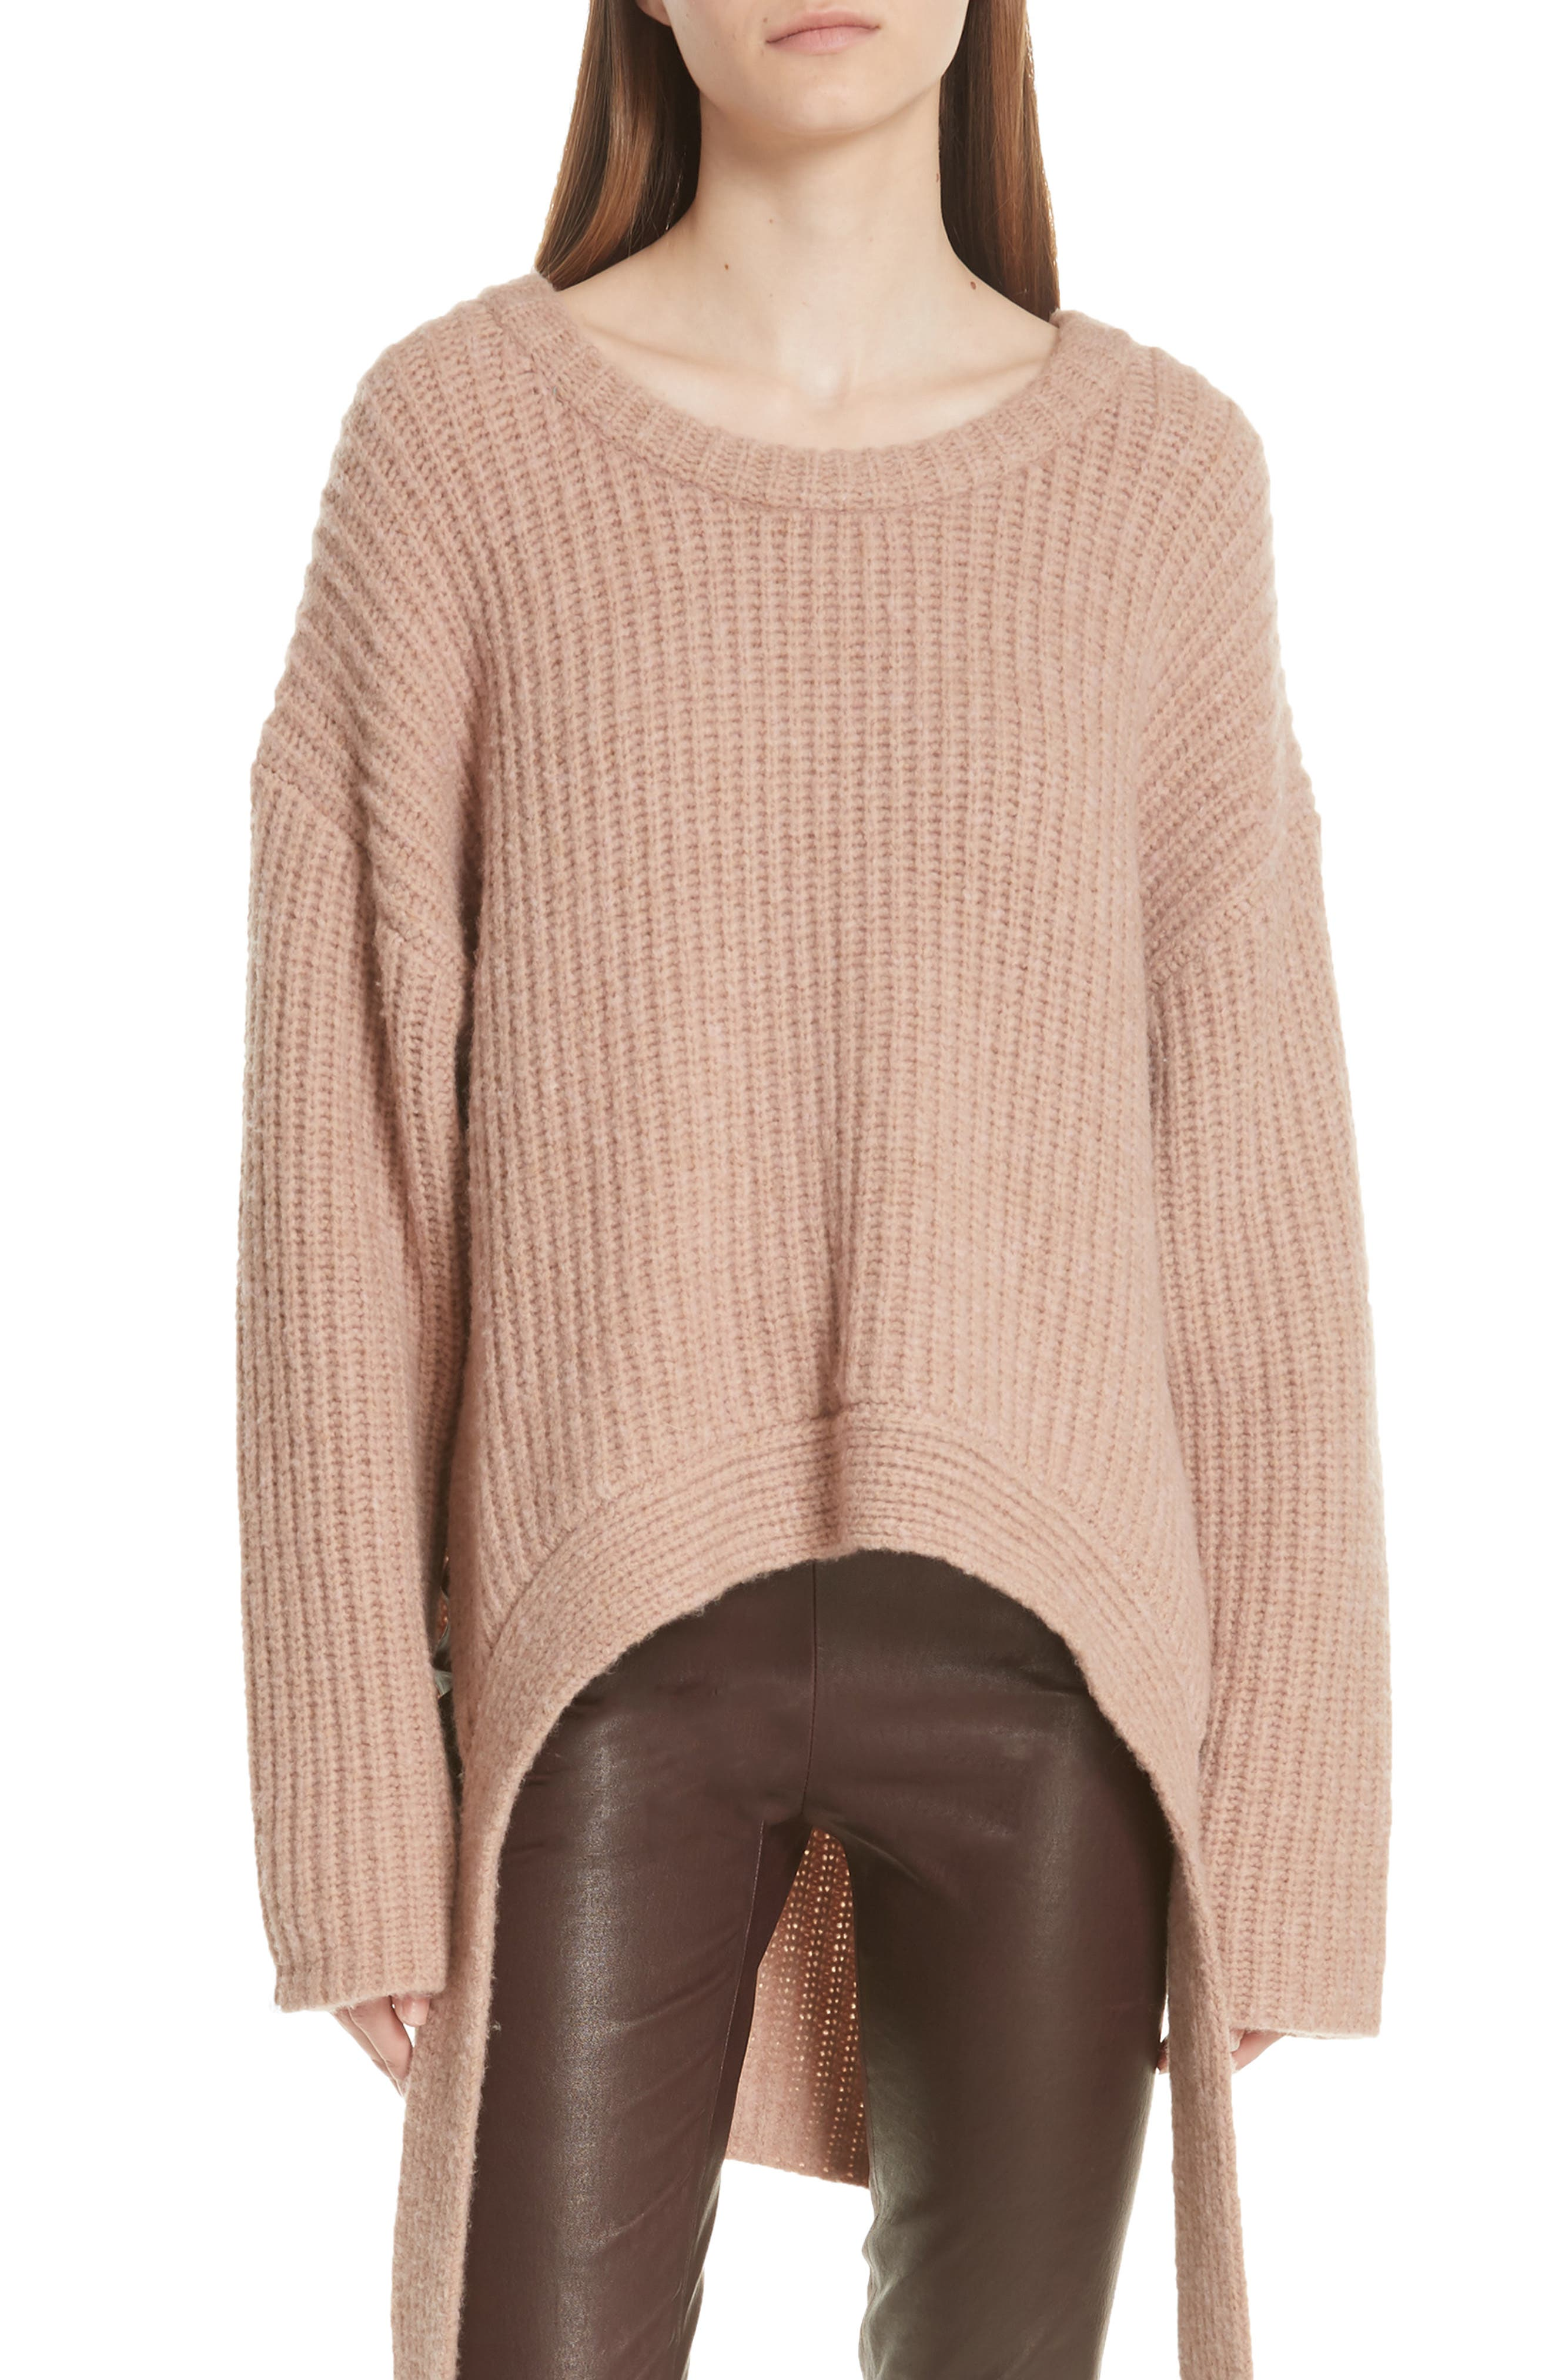 GREY JASON WU Olympia Merino Wool Blend Sweater in Oleander Olndr